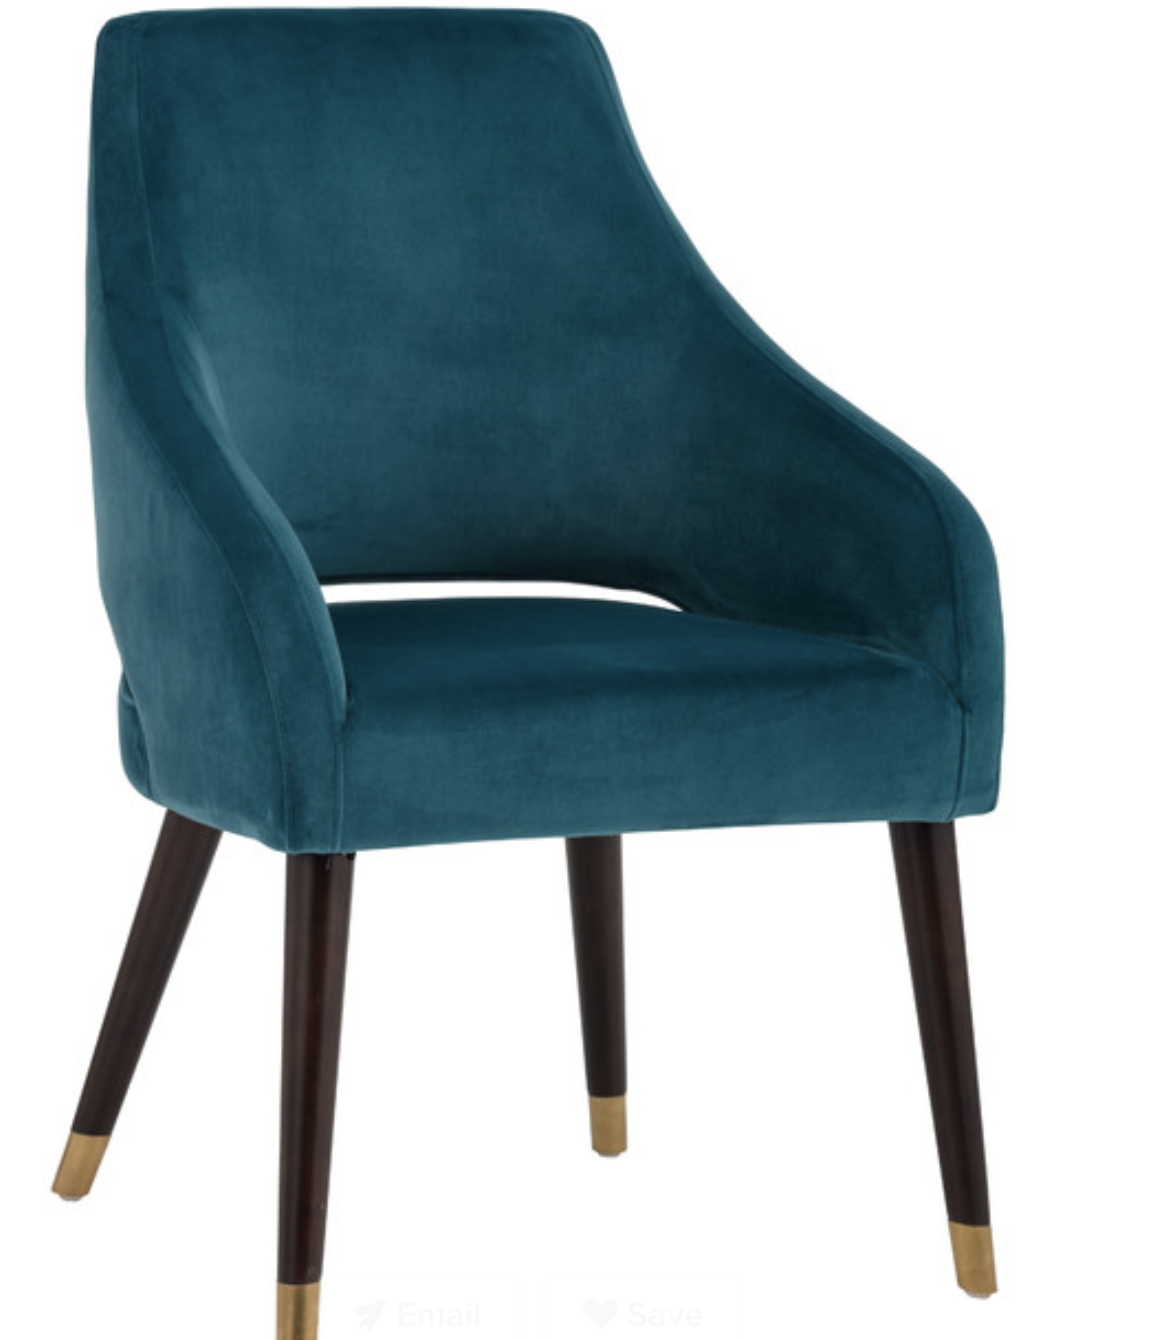 sunpan-adelaide-dining-chair